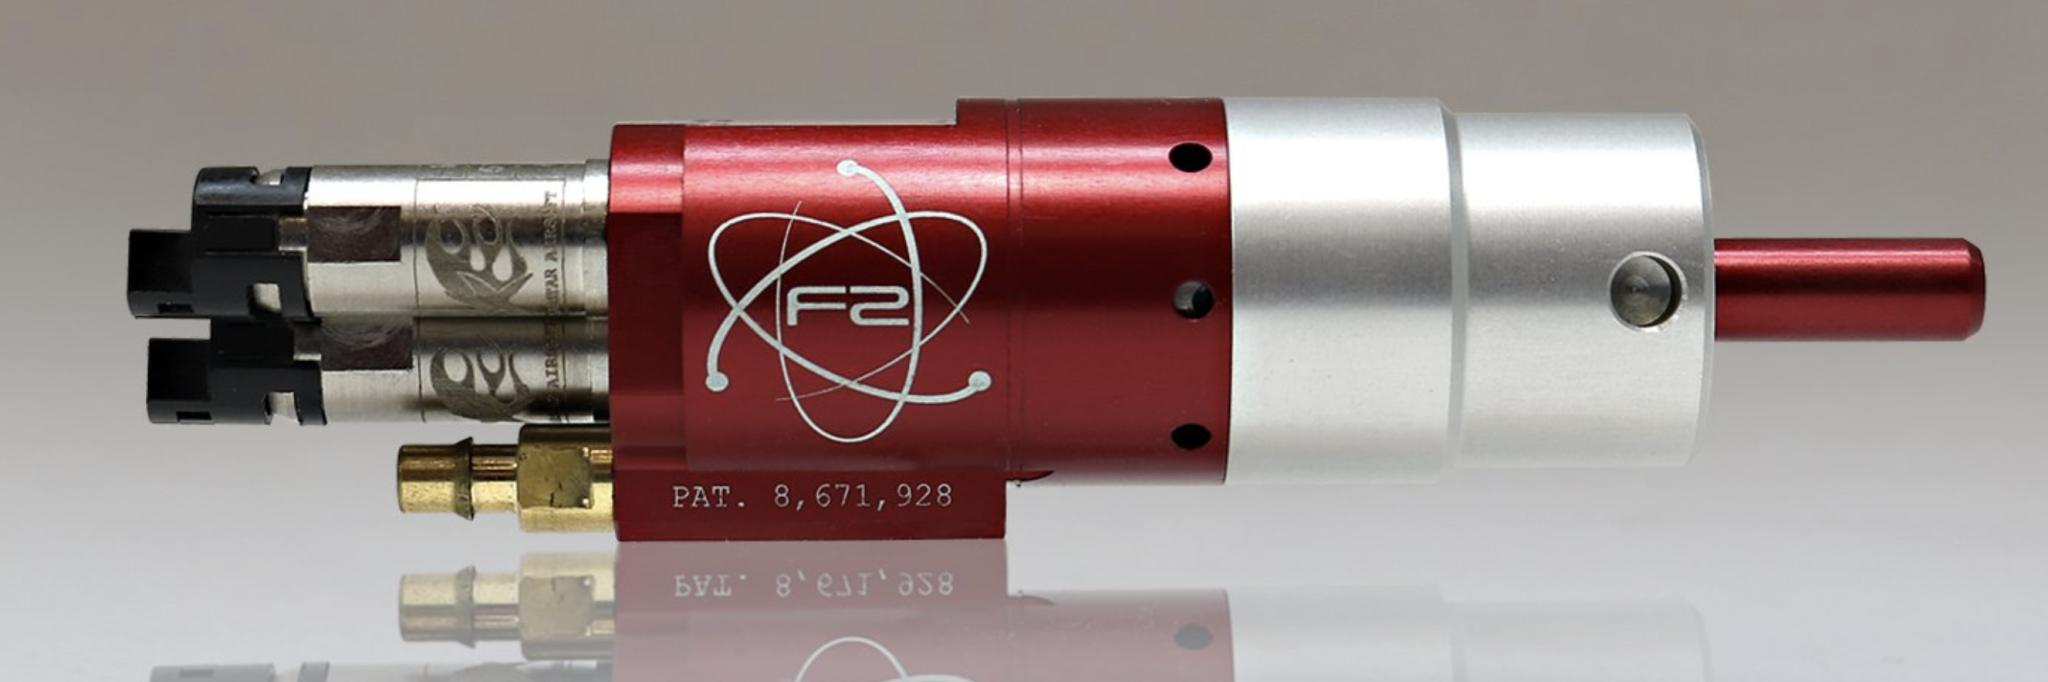 polarstar F2™ HPA Conversion Kit M4/m16